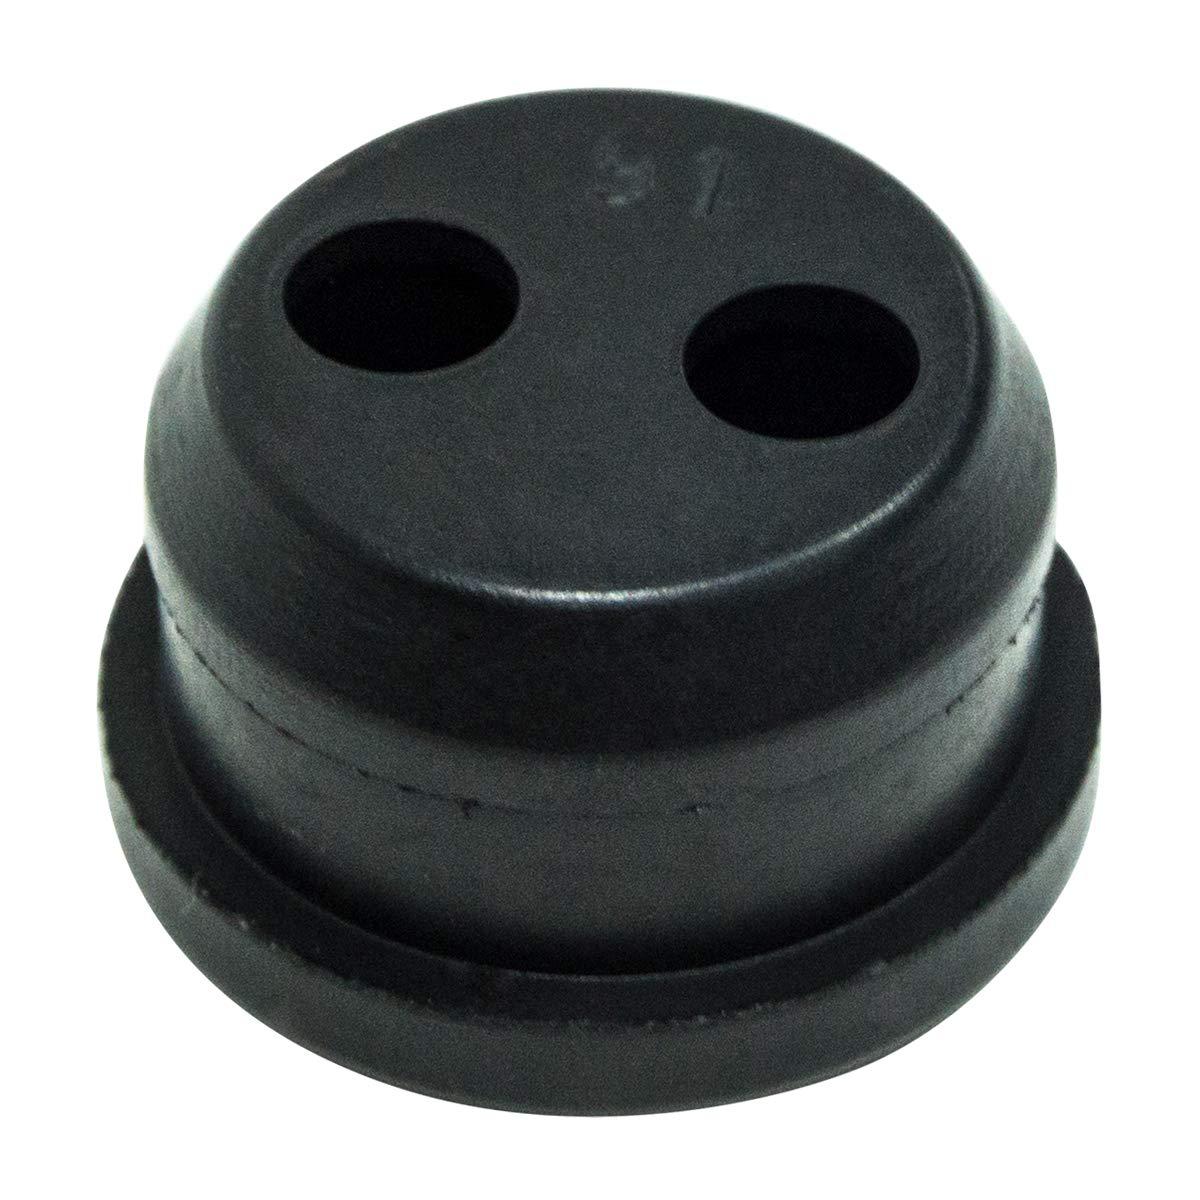 1500 6PK Genuine OEM Echo 2 Two-Hole Fuel Tank Grommet Seals for HC 2100 /& 13211544330 1001 2000